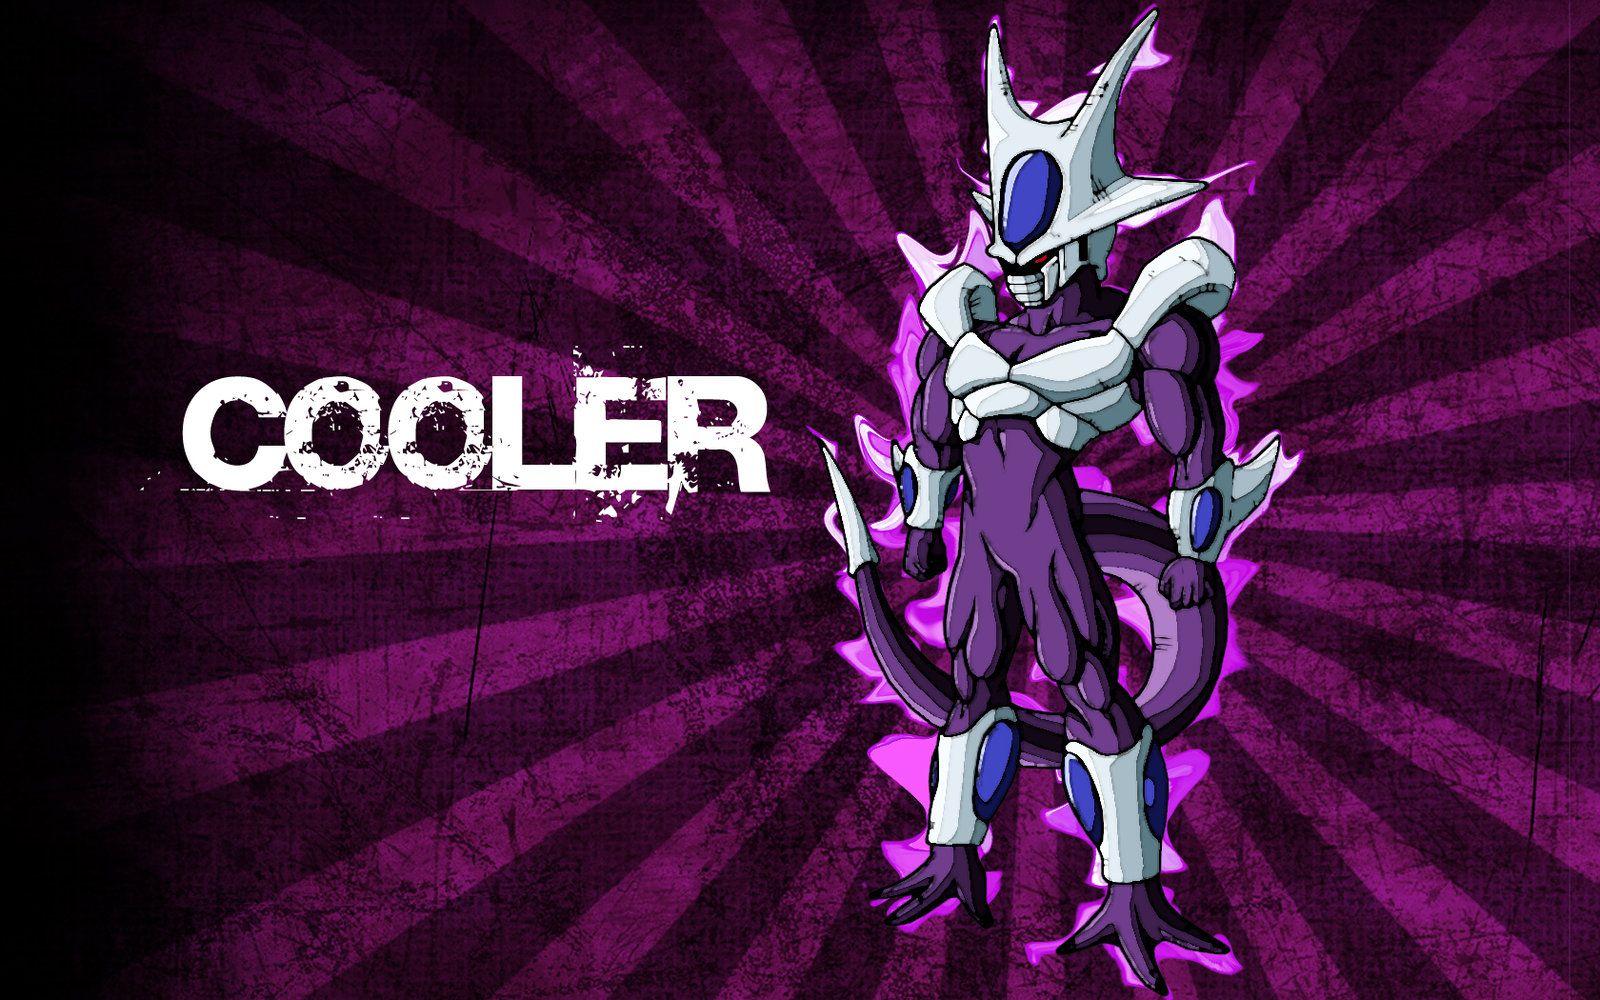 DRAGON BALL Z WALLPAPERS Cooler Final Form